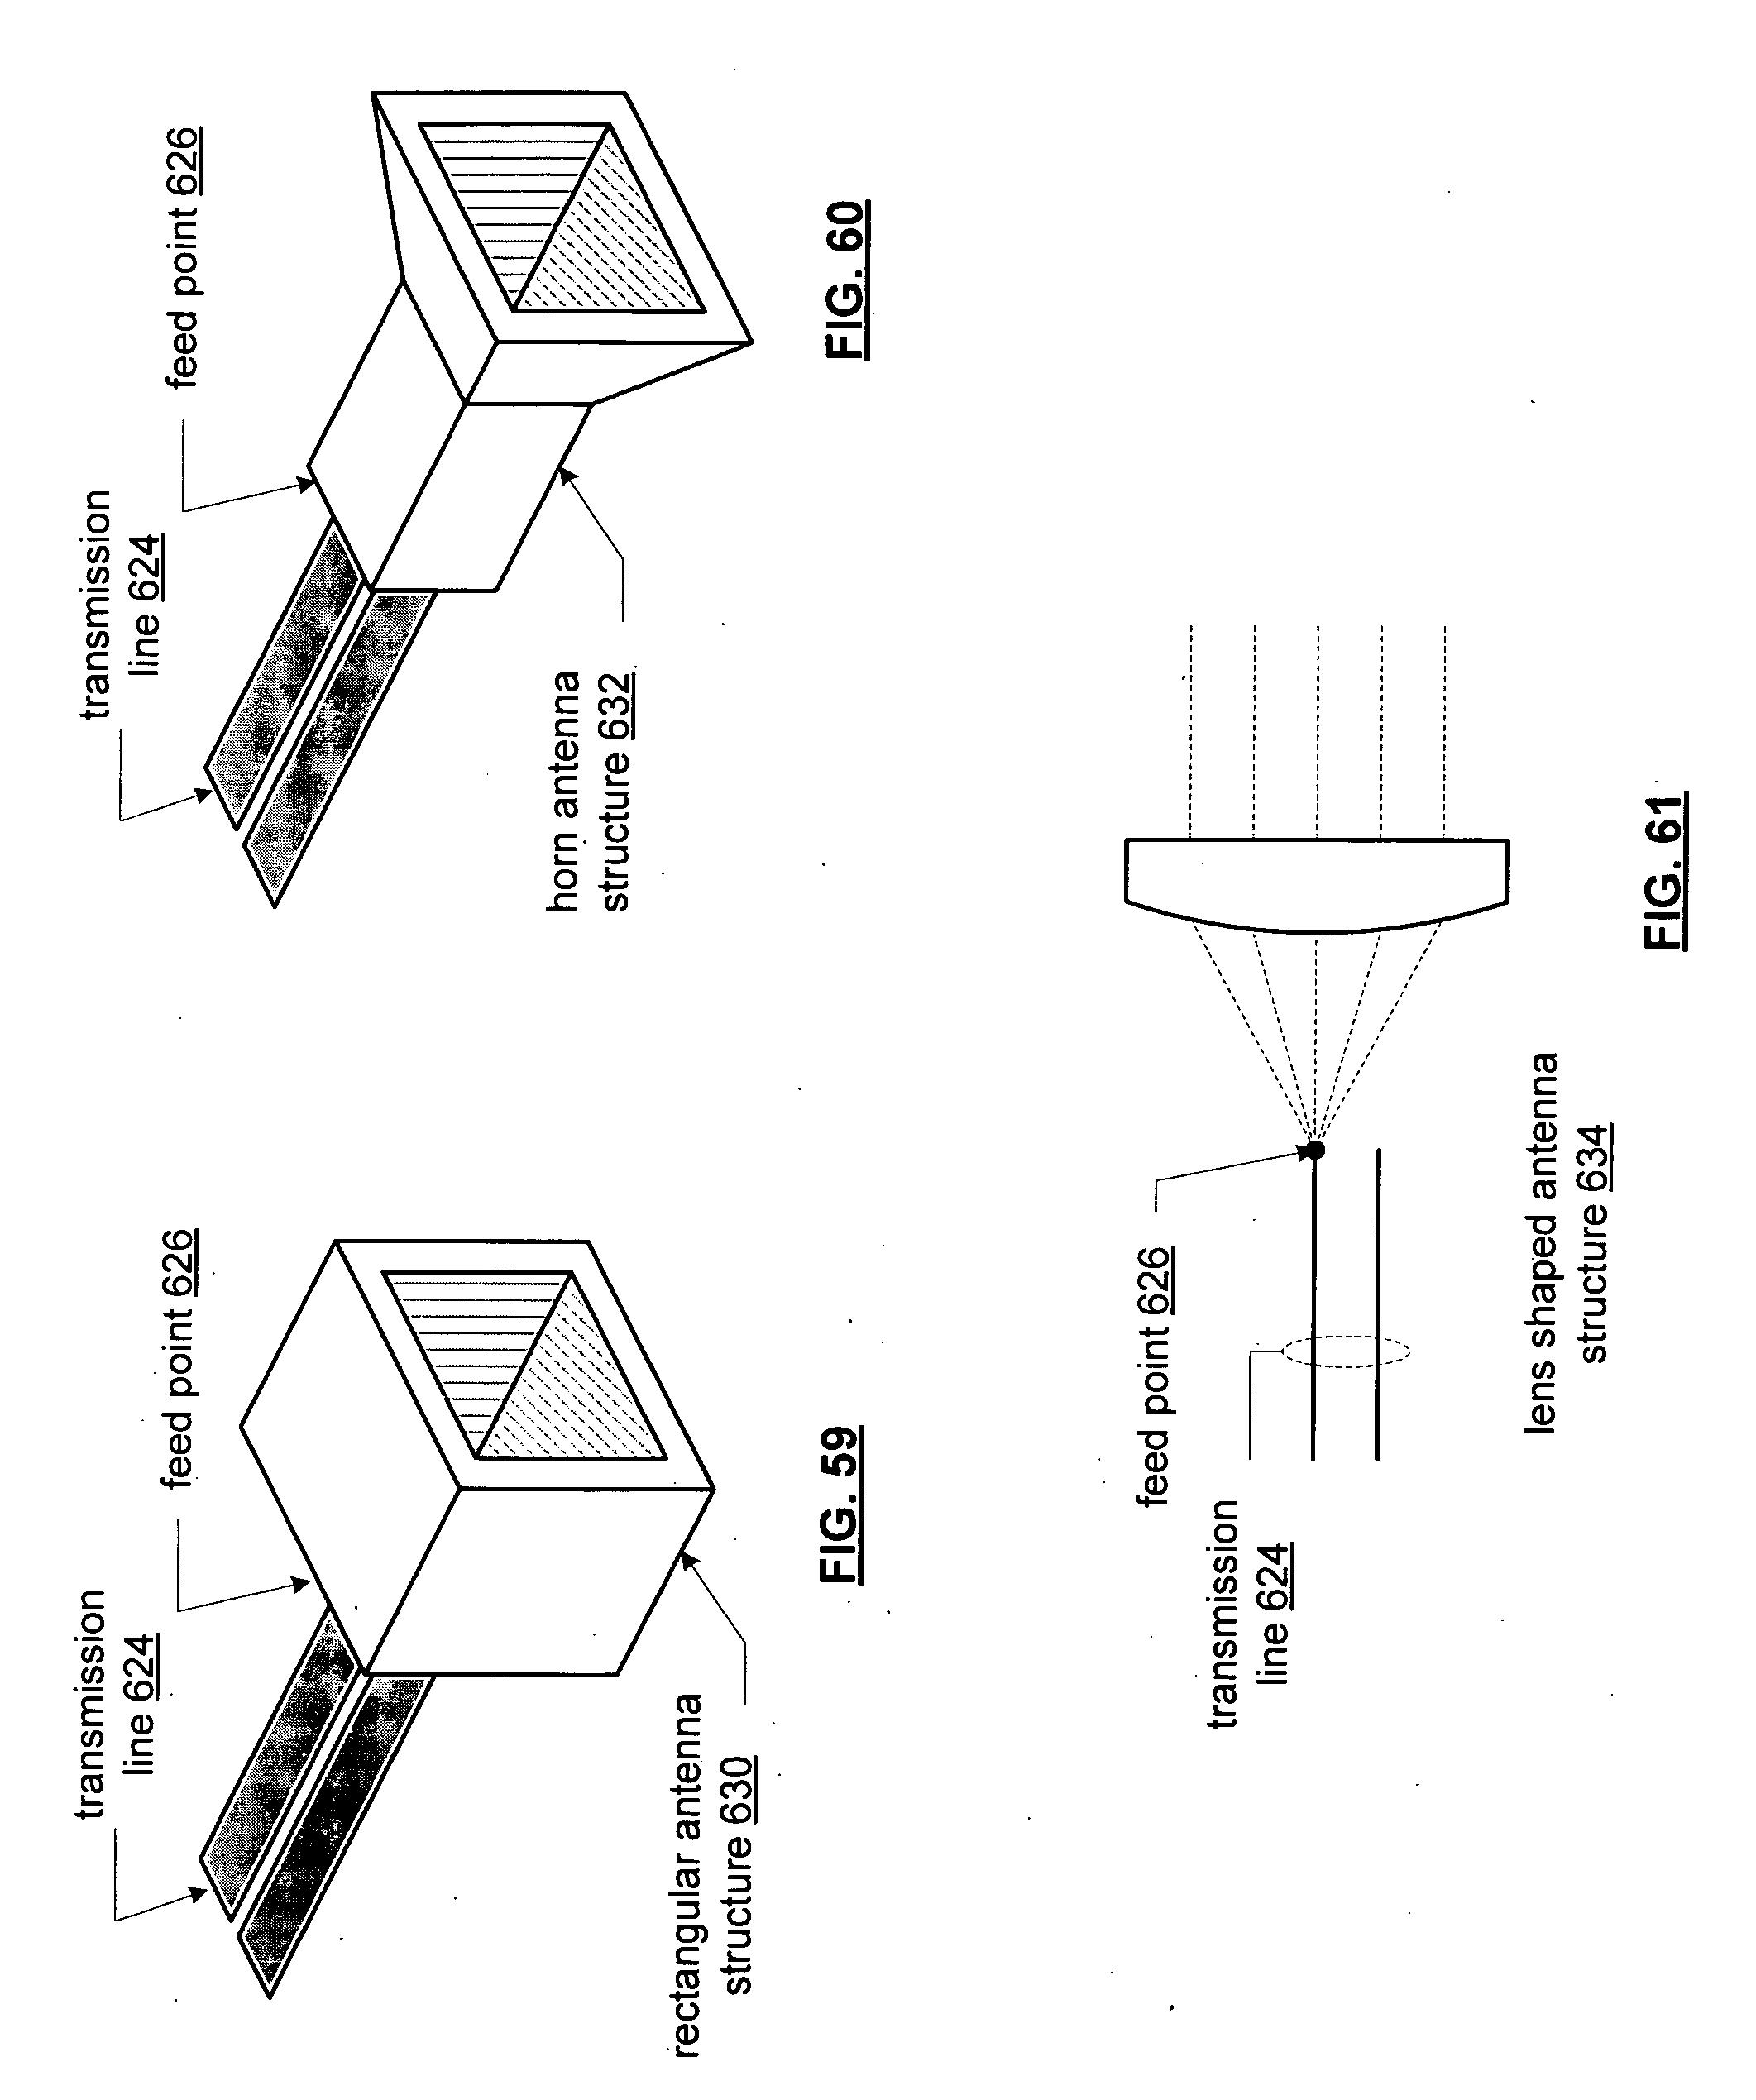 Transmission Line Enclosure Design   Wiring Diagram Database